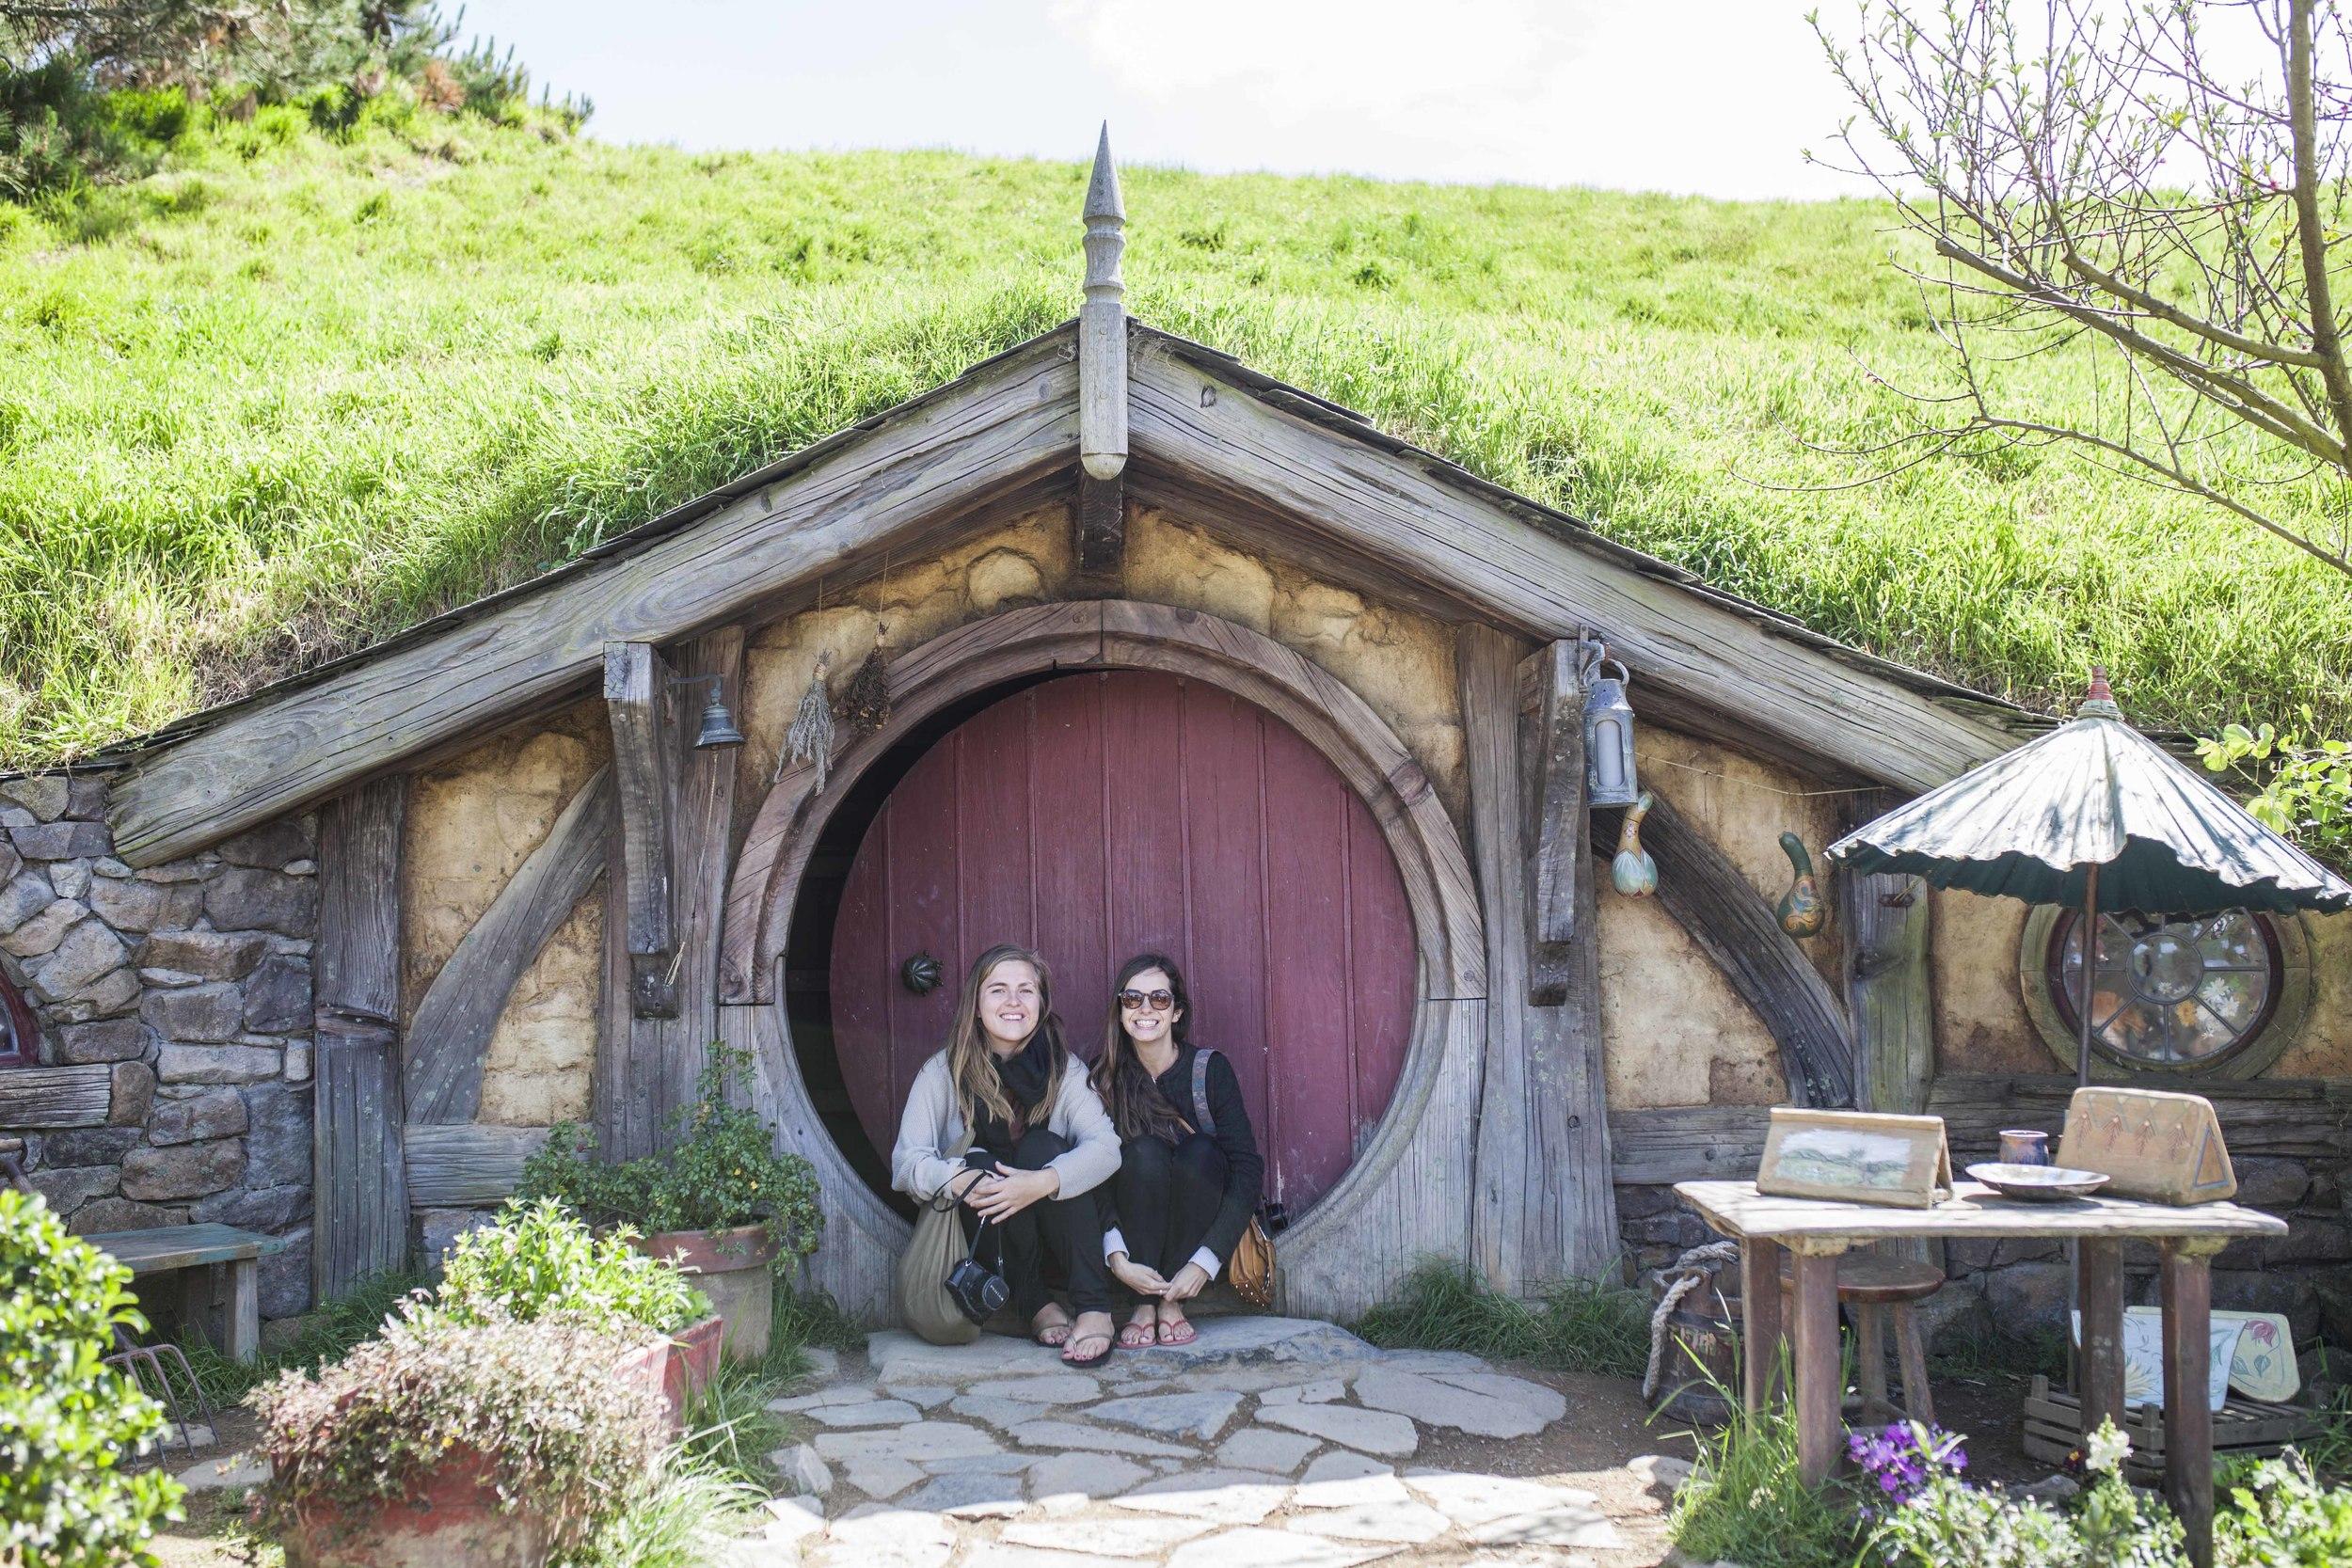 068Toronto Lifestyle Photographers -Hobbiton, New Zealand - Jono & Laynie Co.jpg